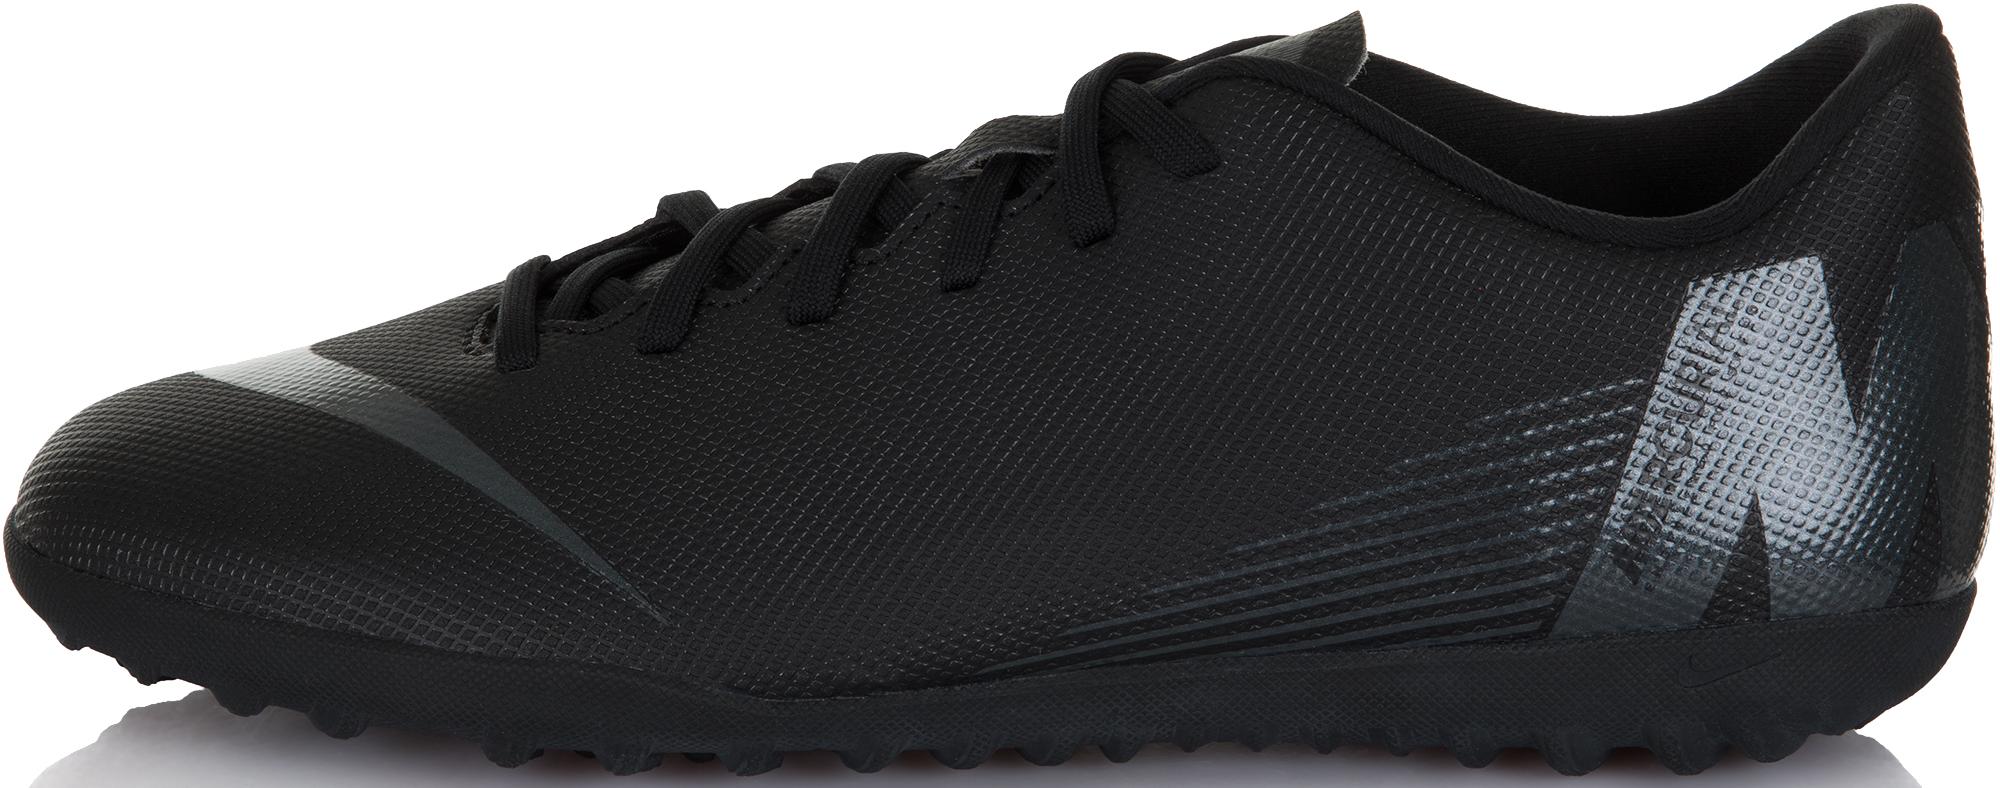 Nike Бутсы мужские Nike VaporX 12 Club TF, размер 45